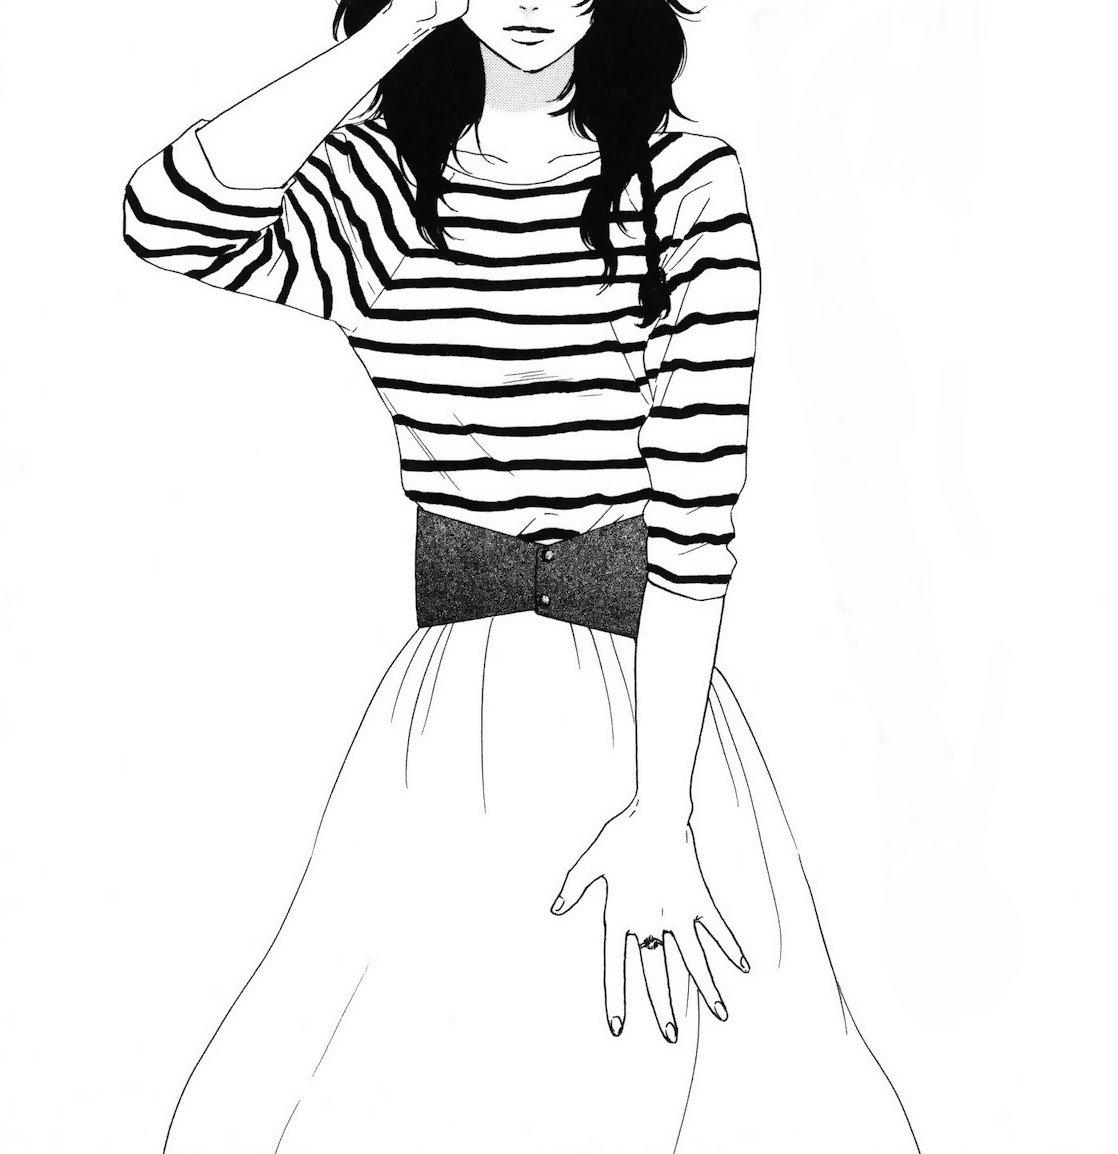 Картинки для лд черно белые для срисовки картинки